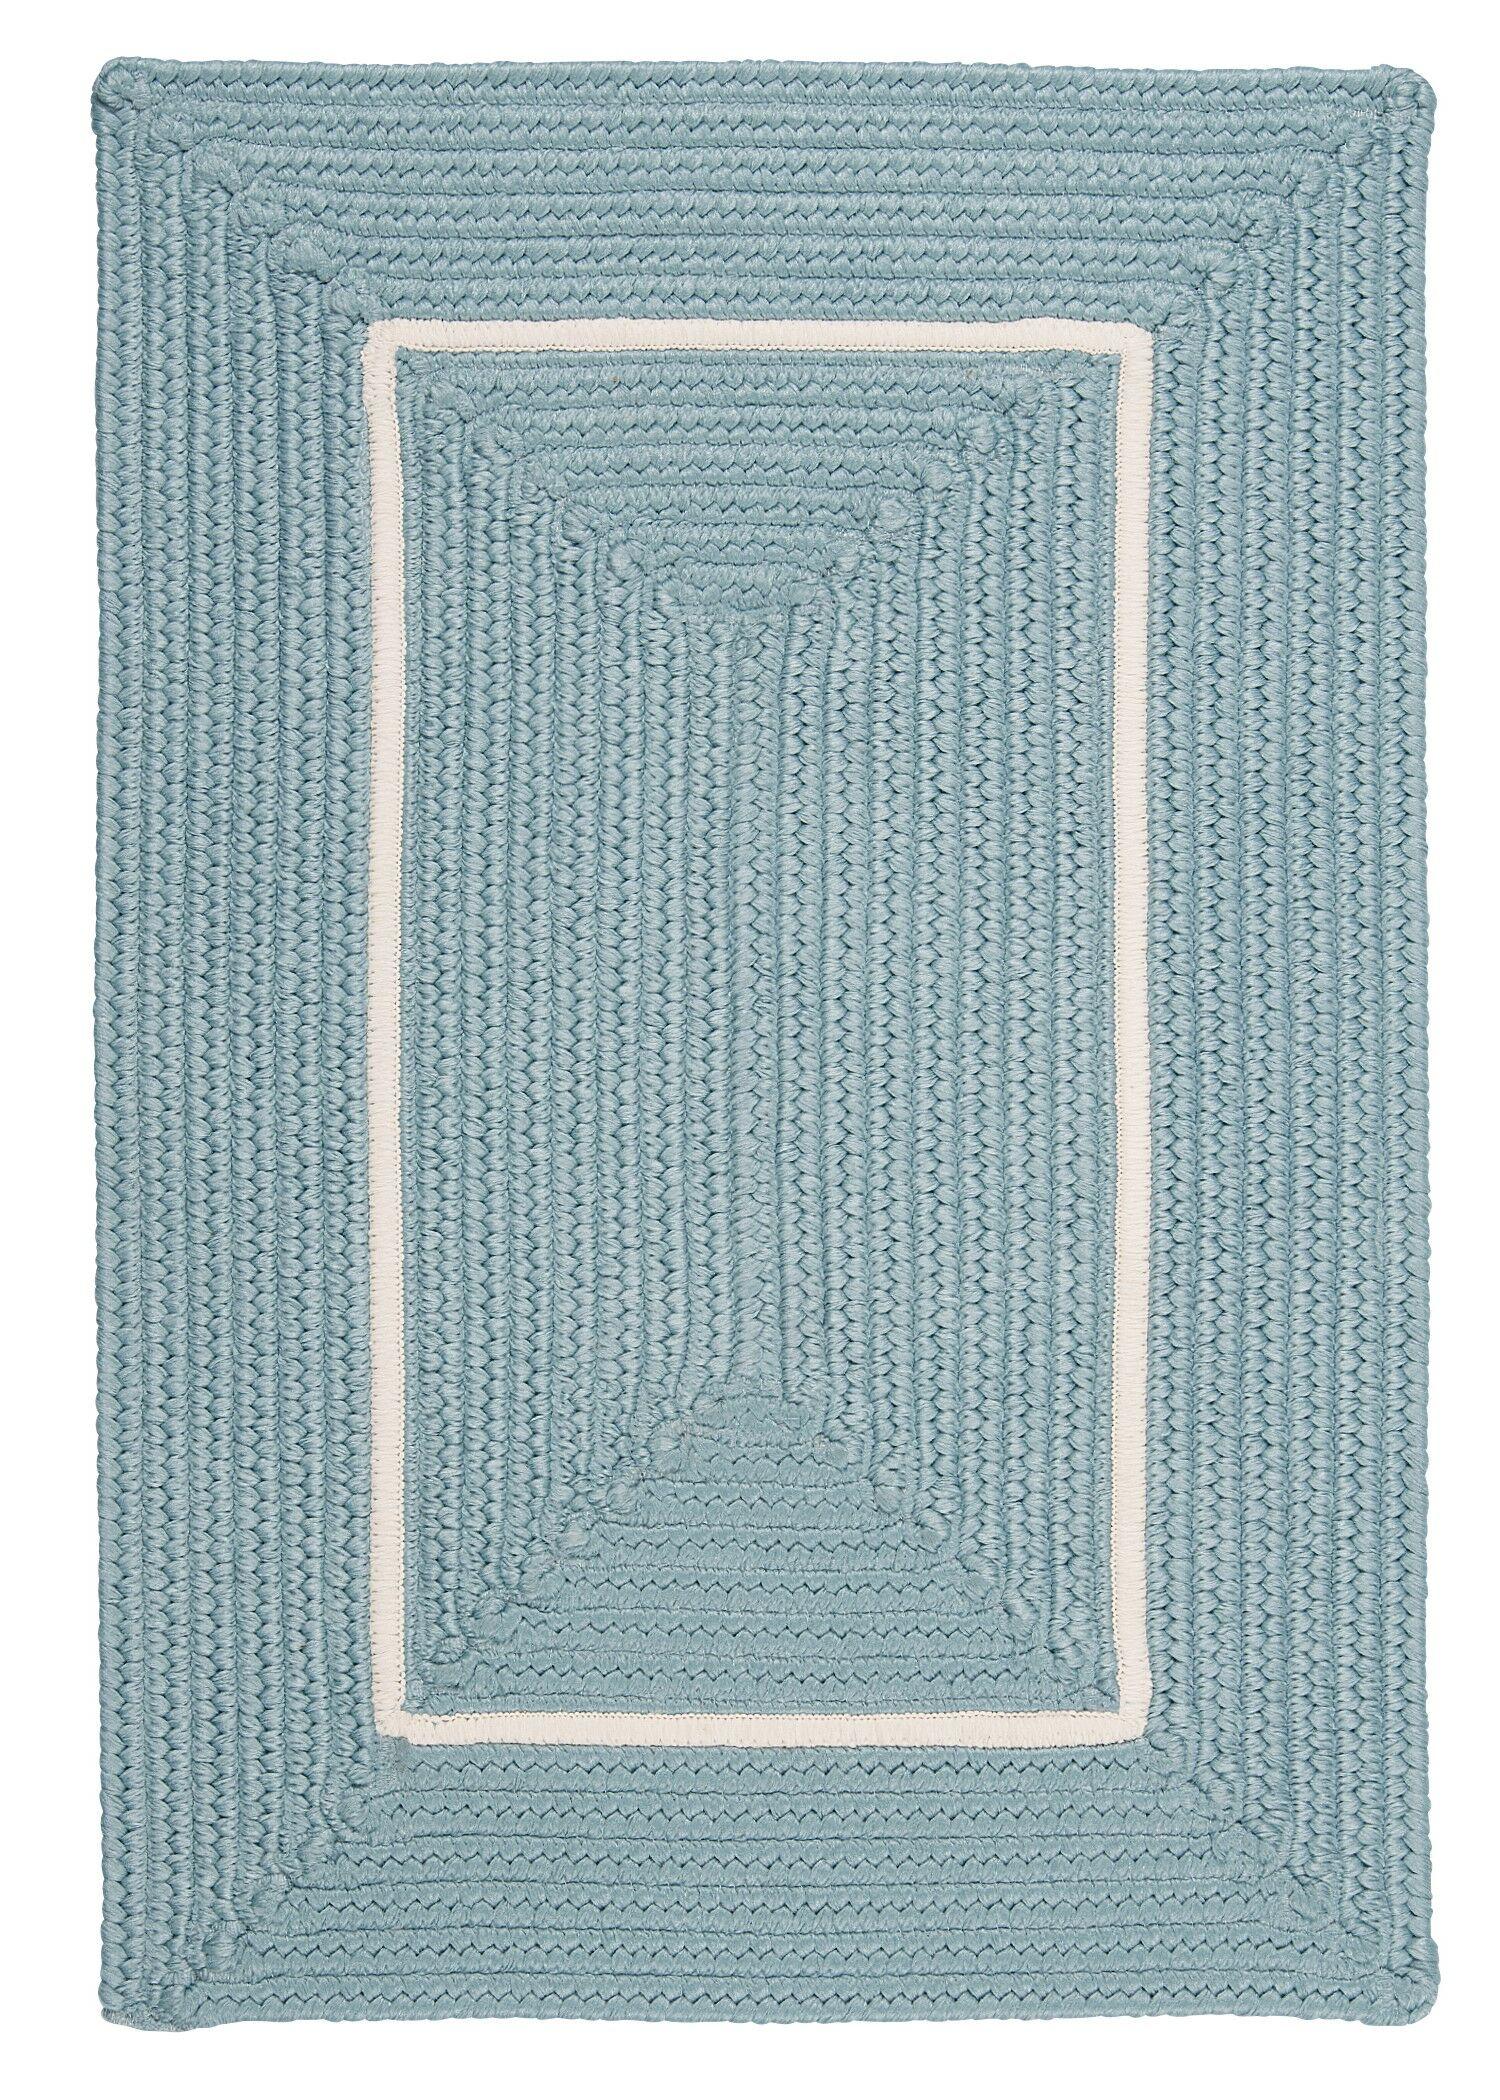 Doodle Edge Light Blue Border in Border Indoor/Outdoor Area Rug Rug Size: 5' x 7'